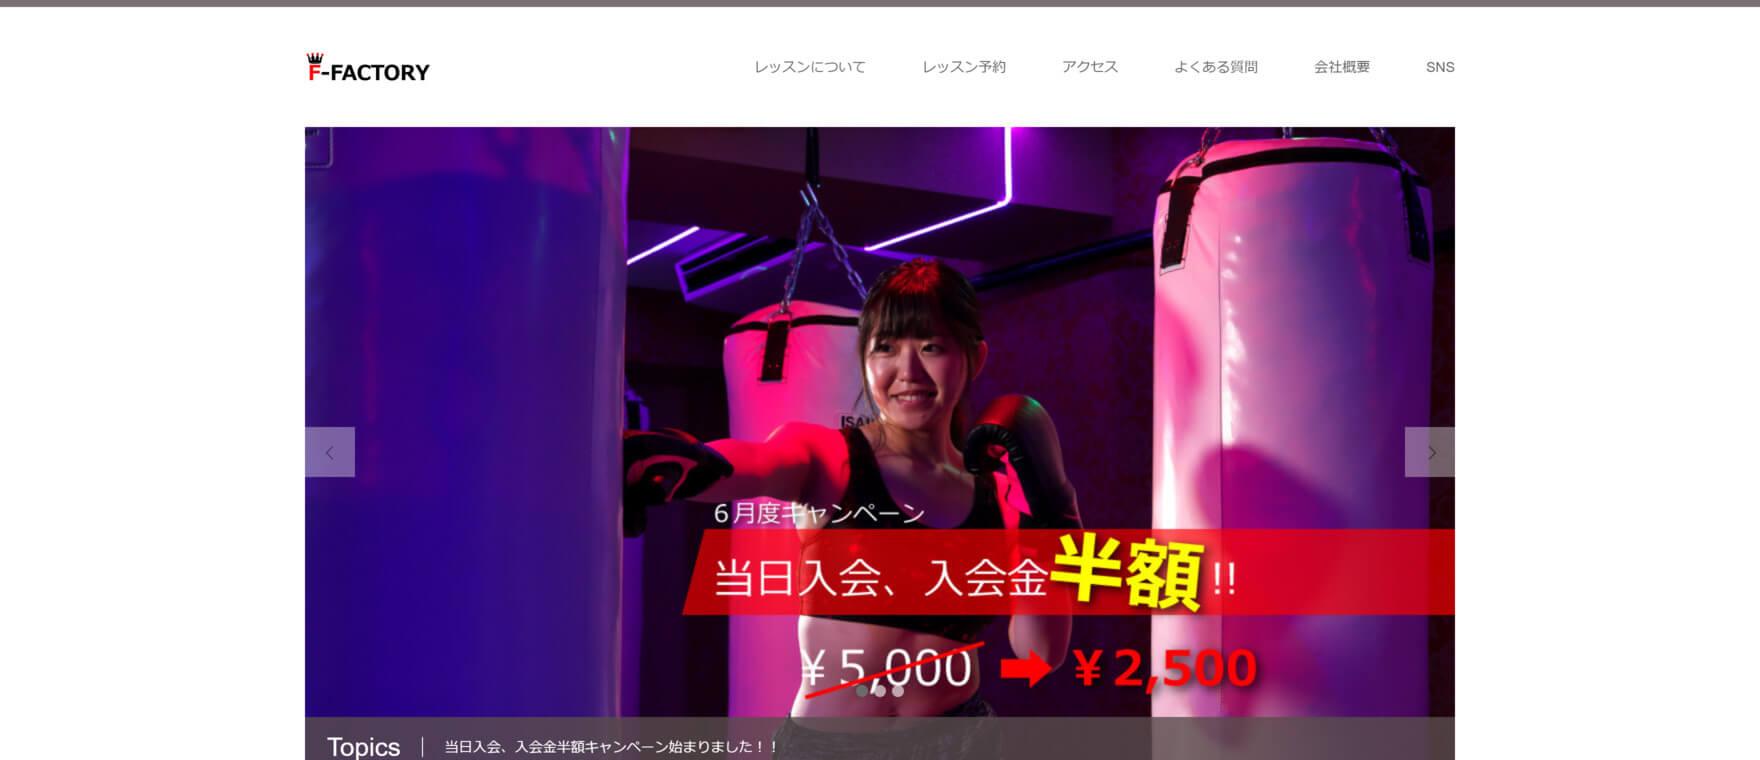 F-FACTORY富士本店のイメージ画像